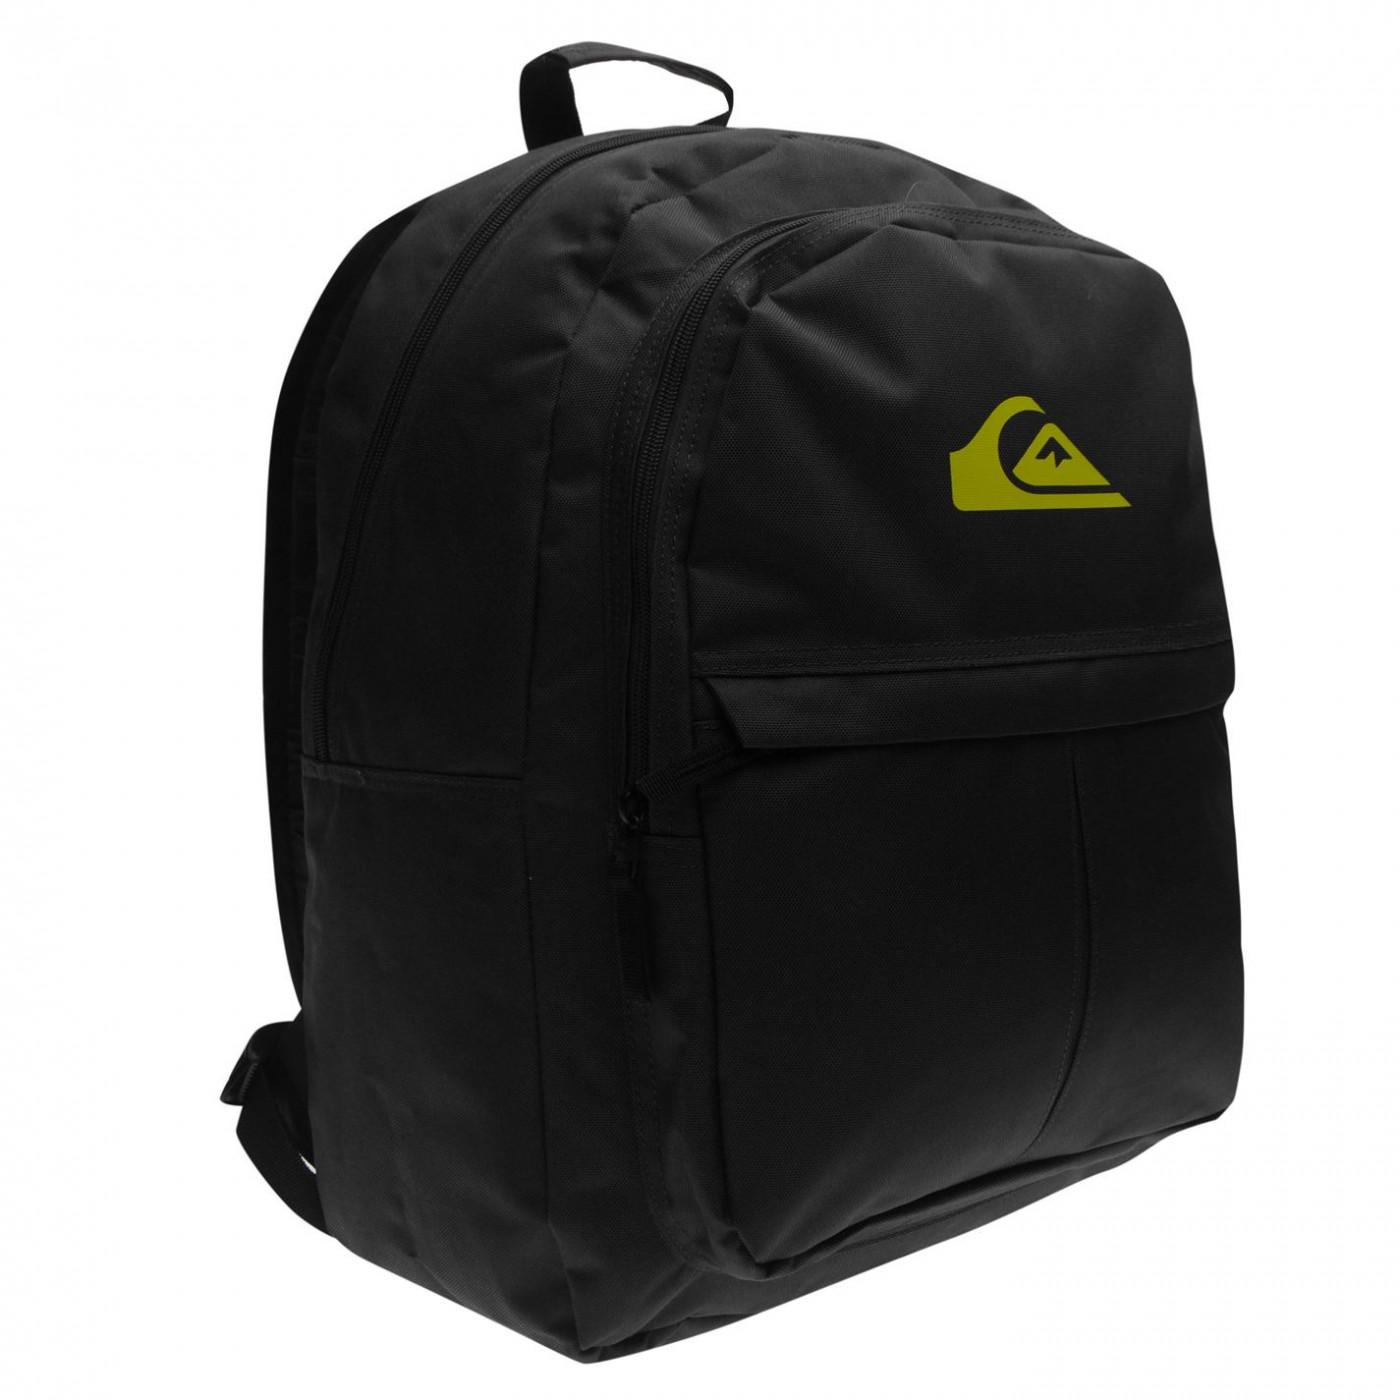 Quiksilver Plain Backpack